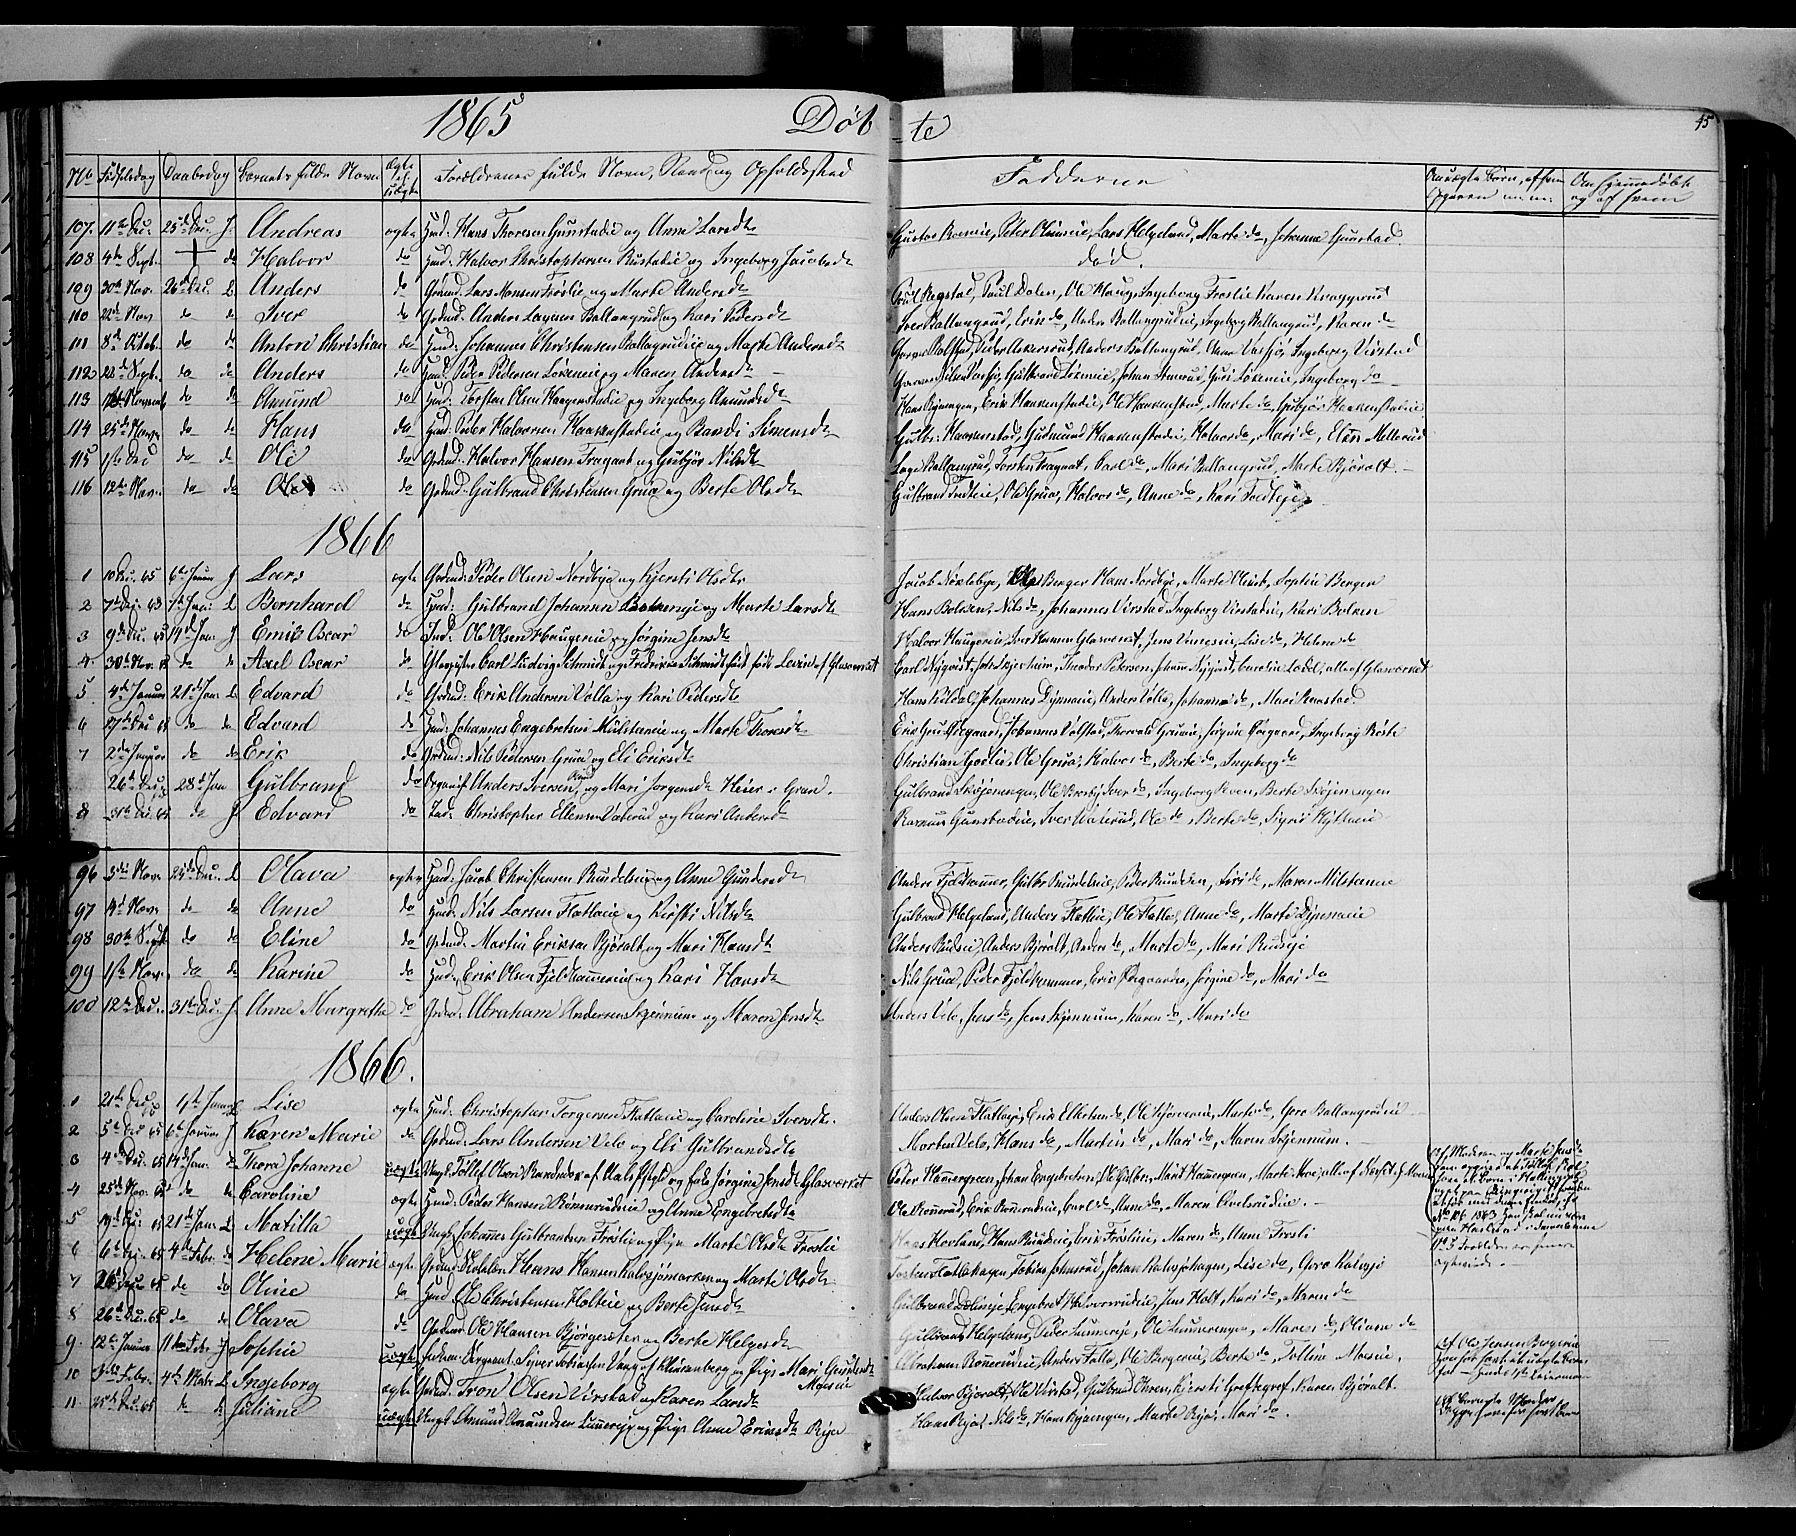 SAH, Jevnaker prestekontor, Ministerialbok nr. 7, 1858-1876, s. 45